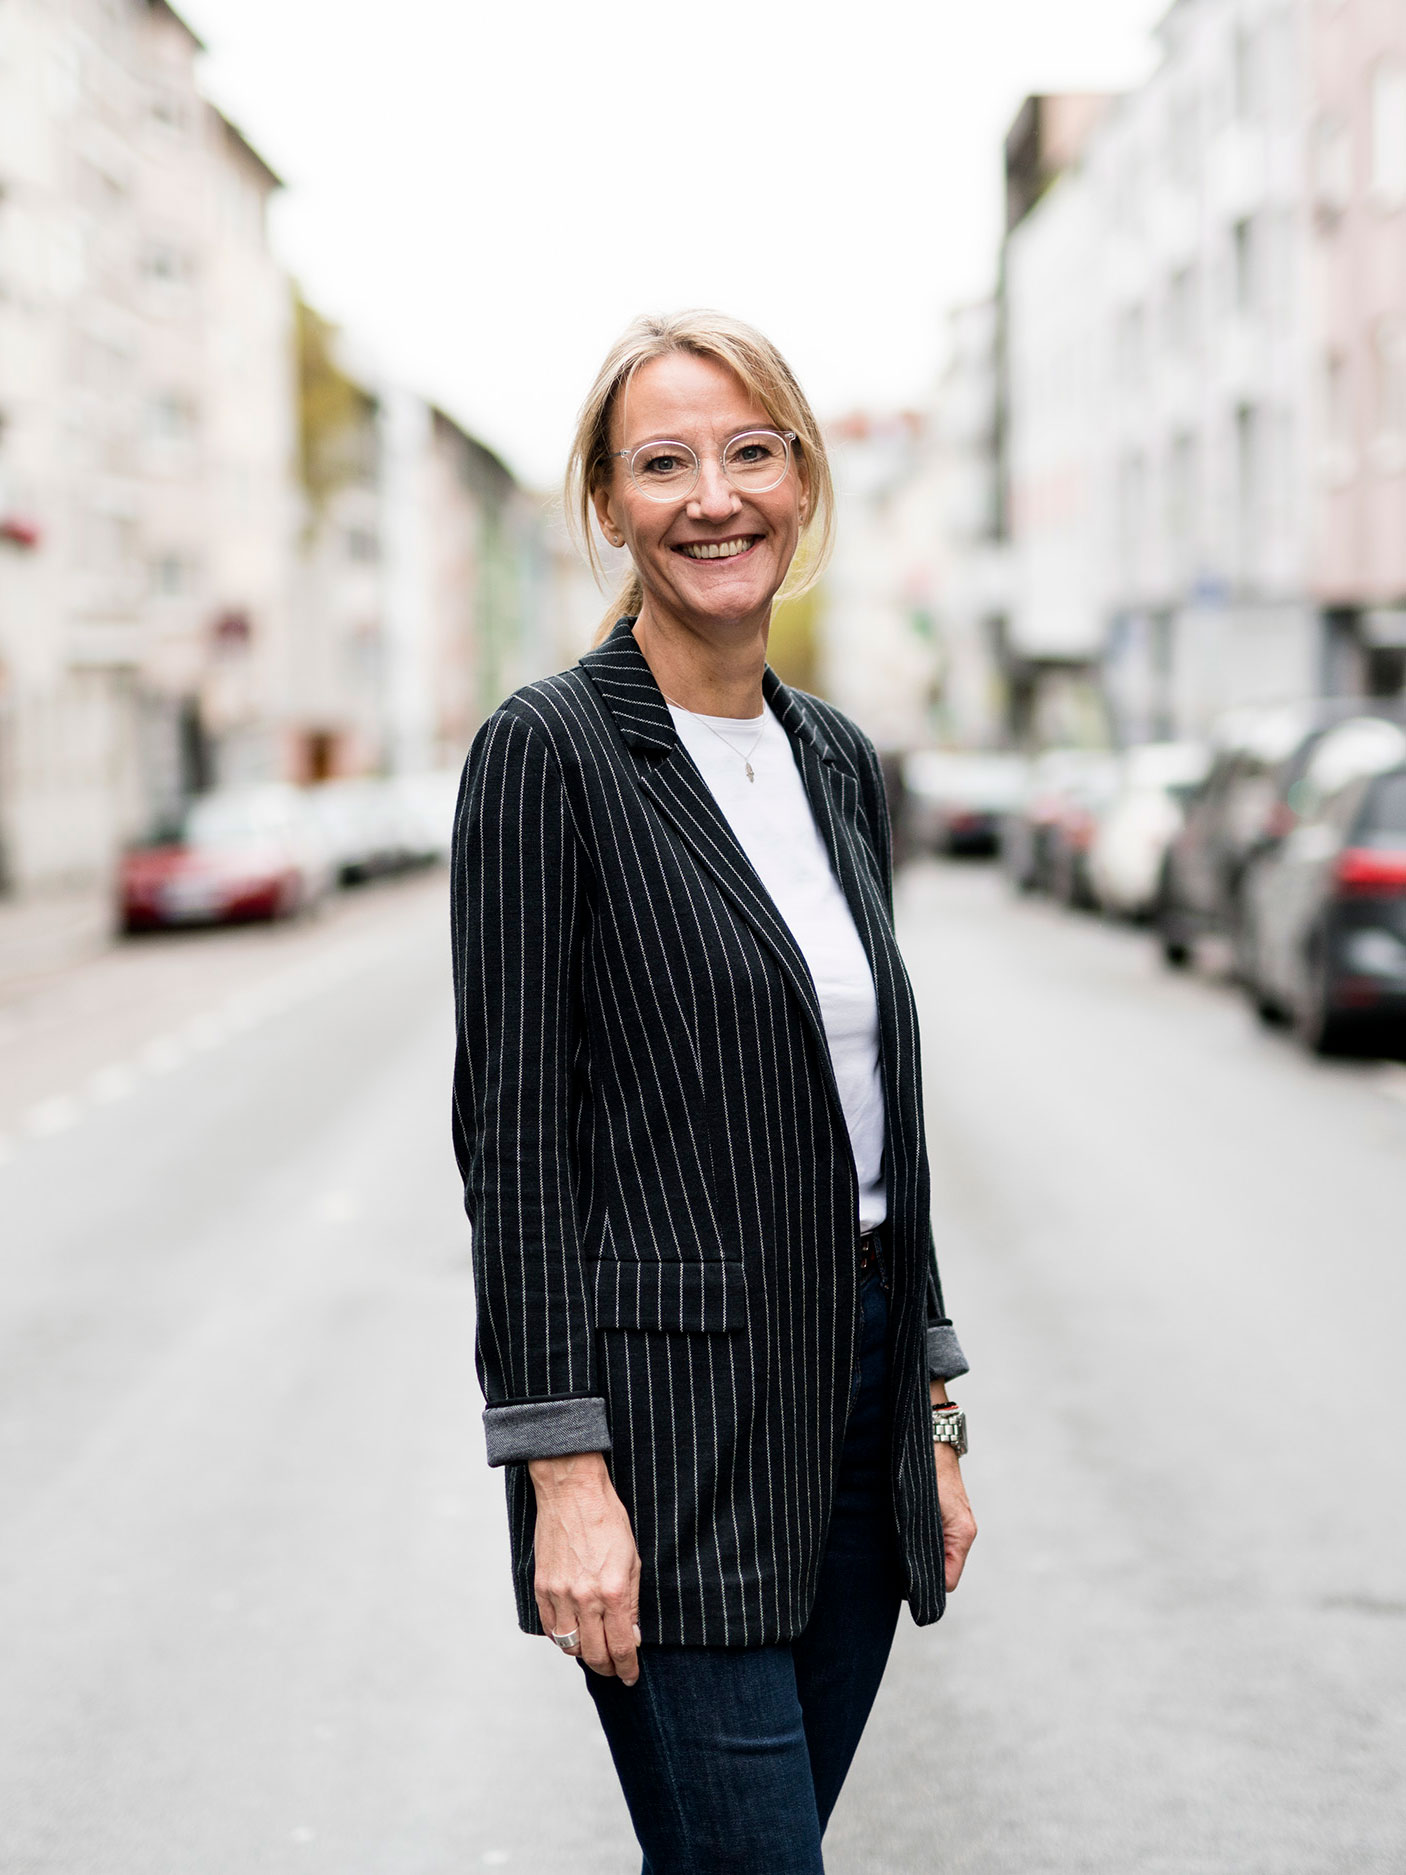 Ursula-Hoffmann-Bild-Sven-Weber-IBA27